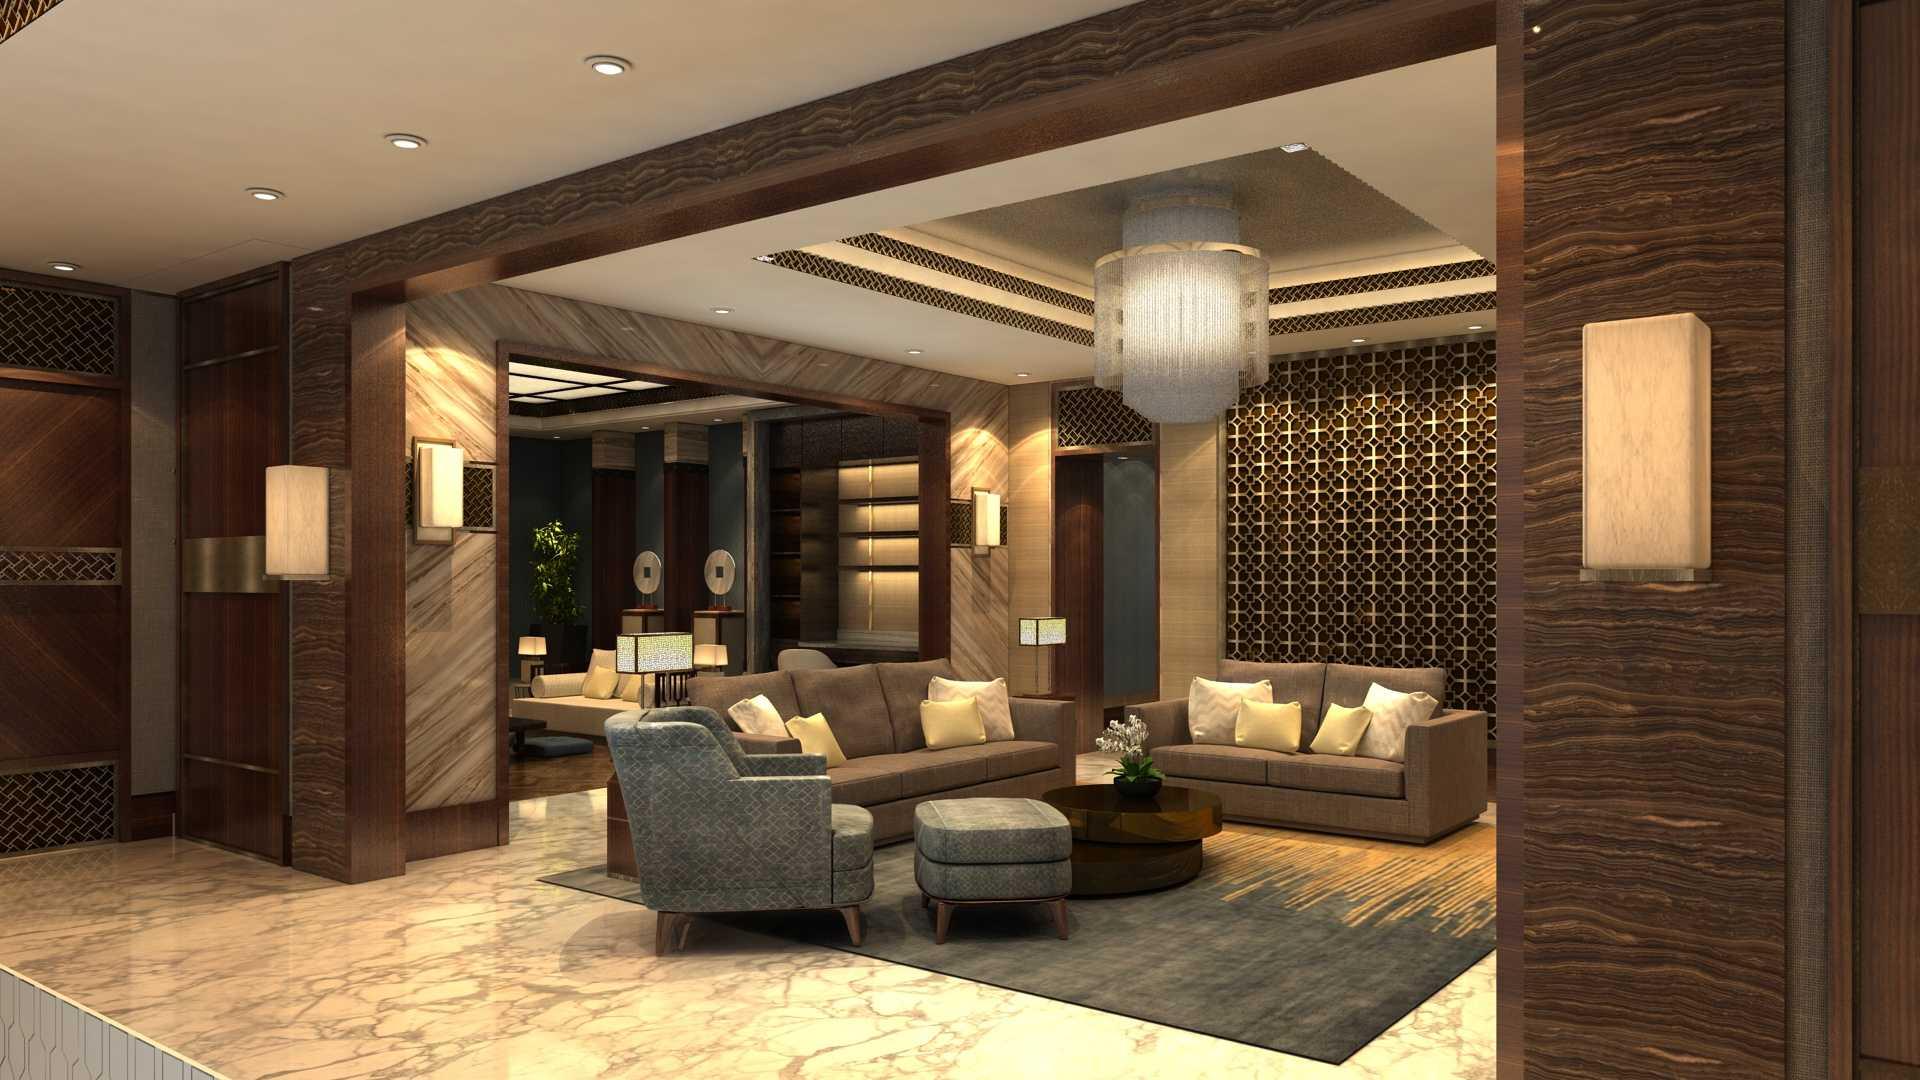 Vin•da•te Mayang Permai Residence Ii - Residential Project (Artist Impression - Construction In Progress) Pantai Indah Kapuk - North Jakarta Pantai Indah Kapuk - North Jakarta Lt Kontemporer  17214